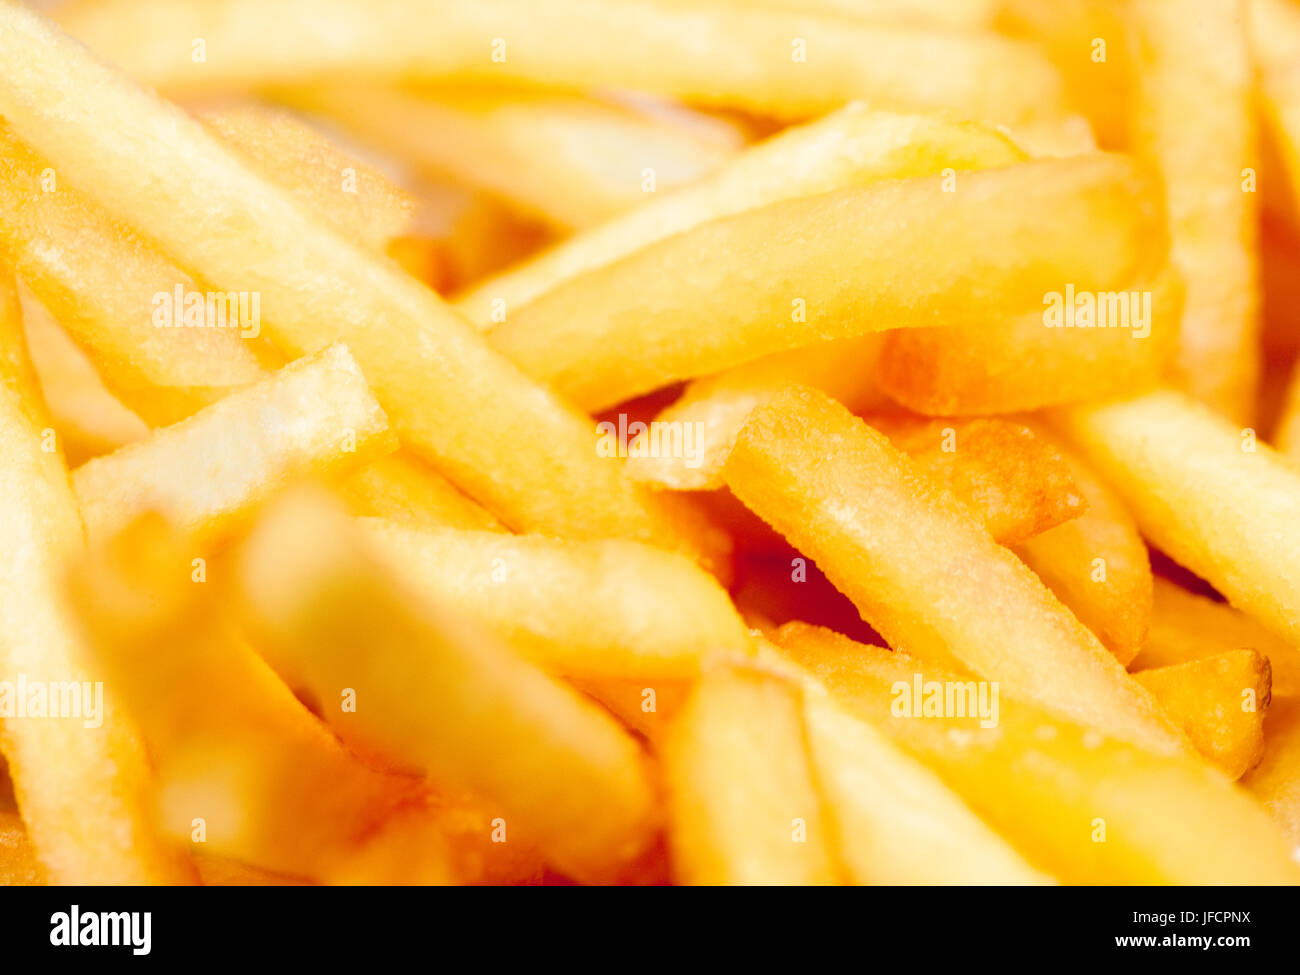 Extreme Nahaufnahme von Pommes Frittes /French Fries Stockbild